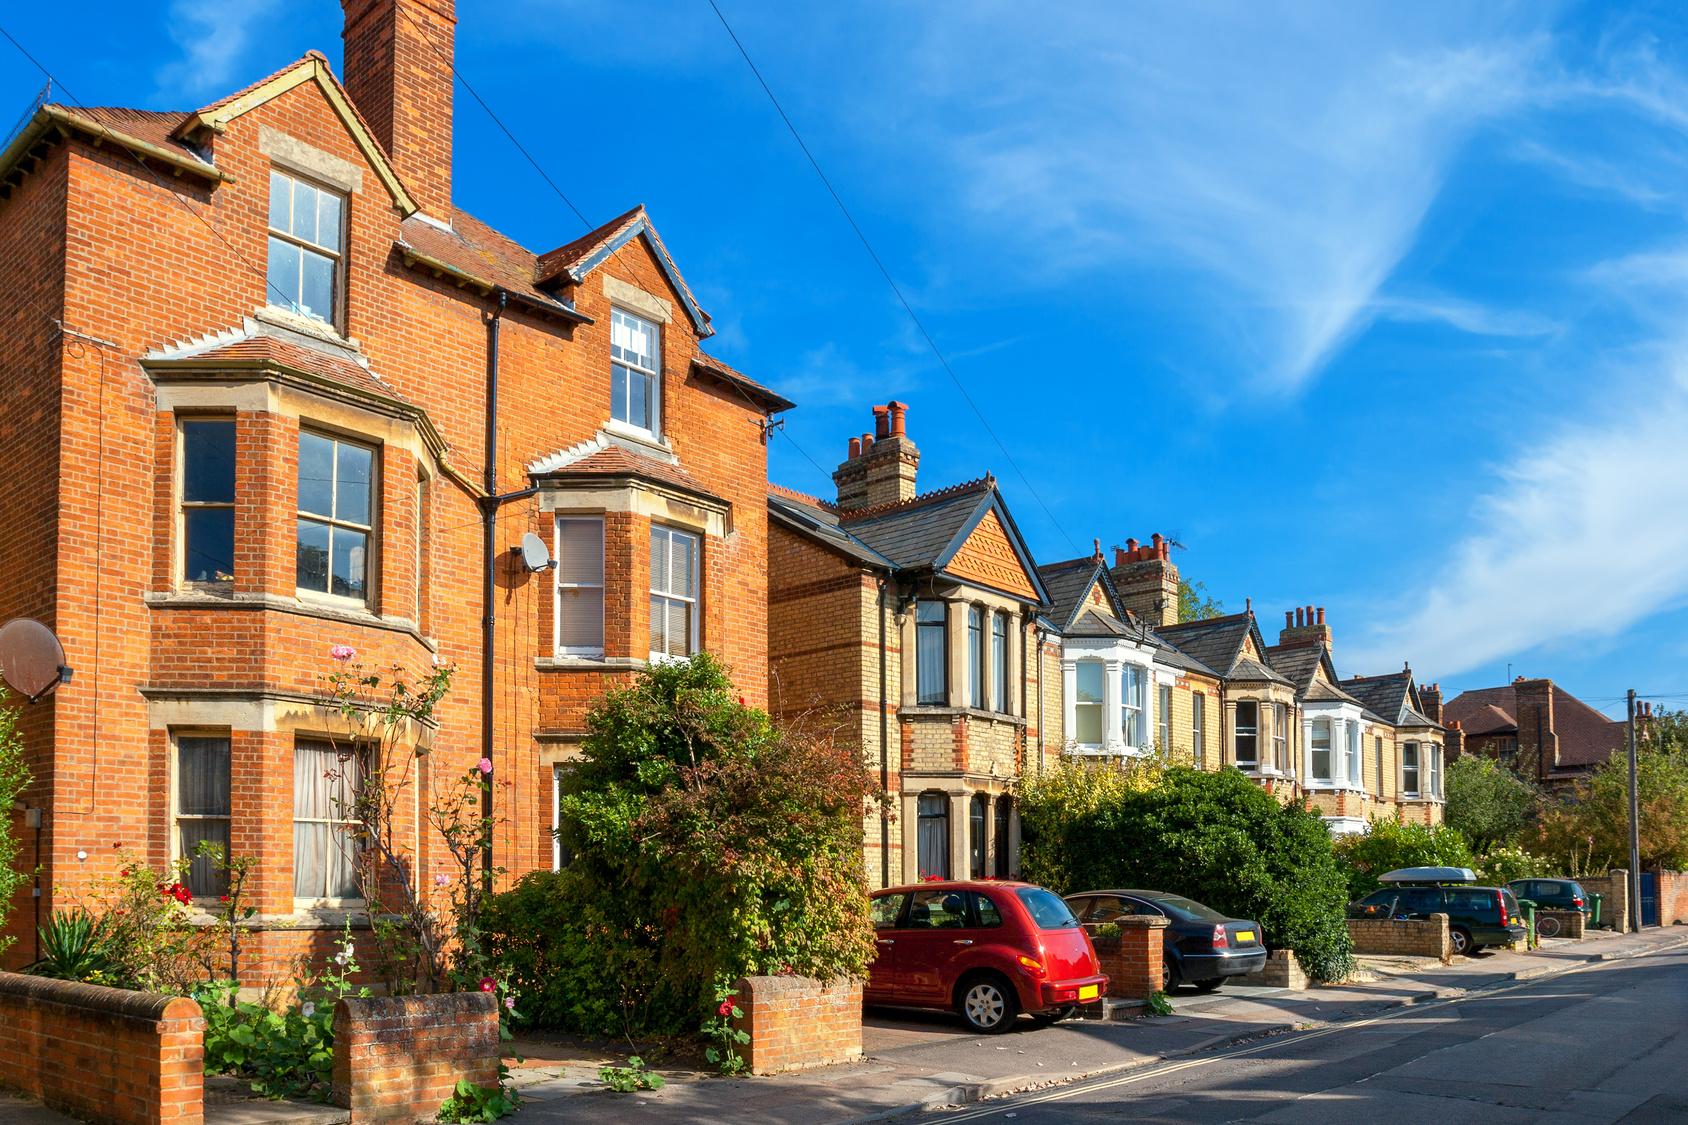 Town houses. Oxford, England